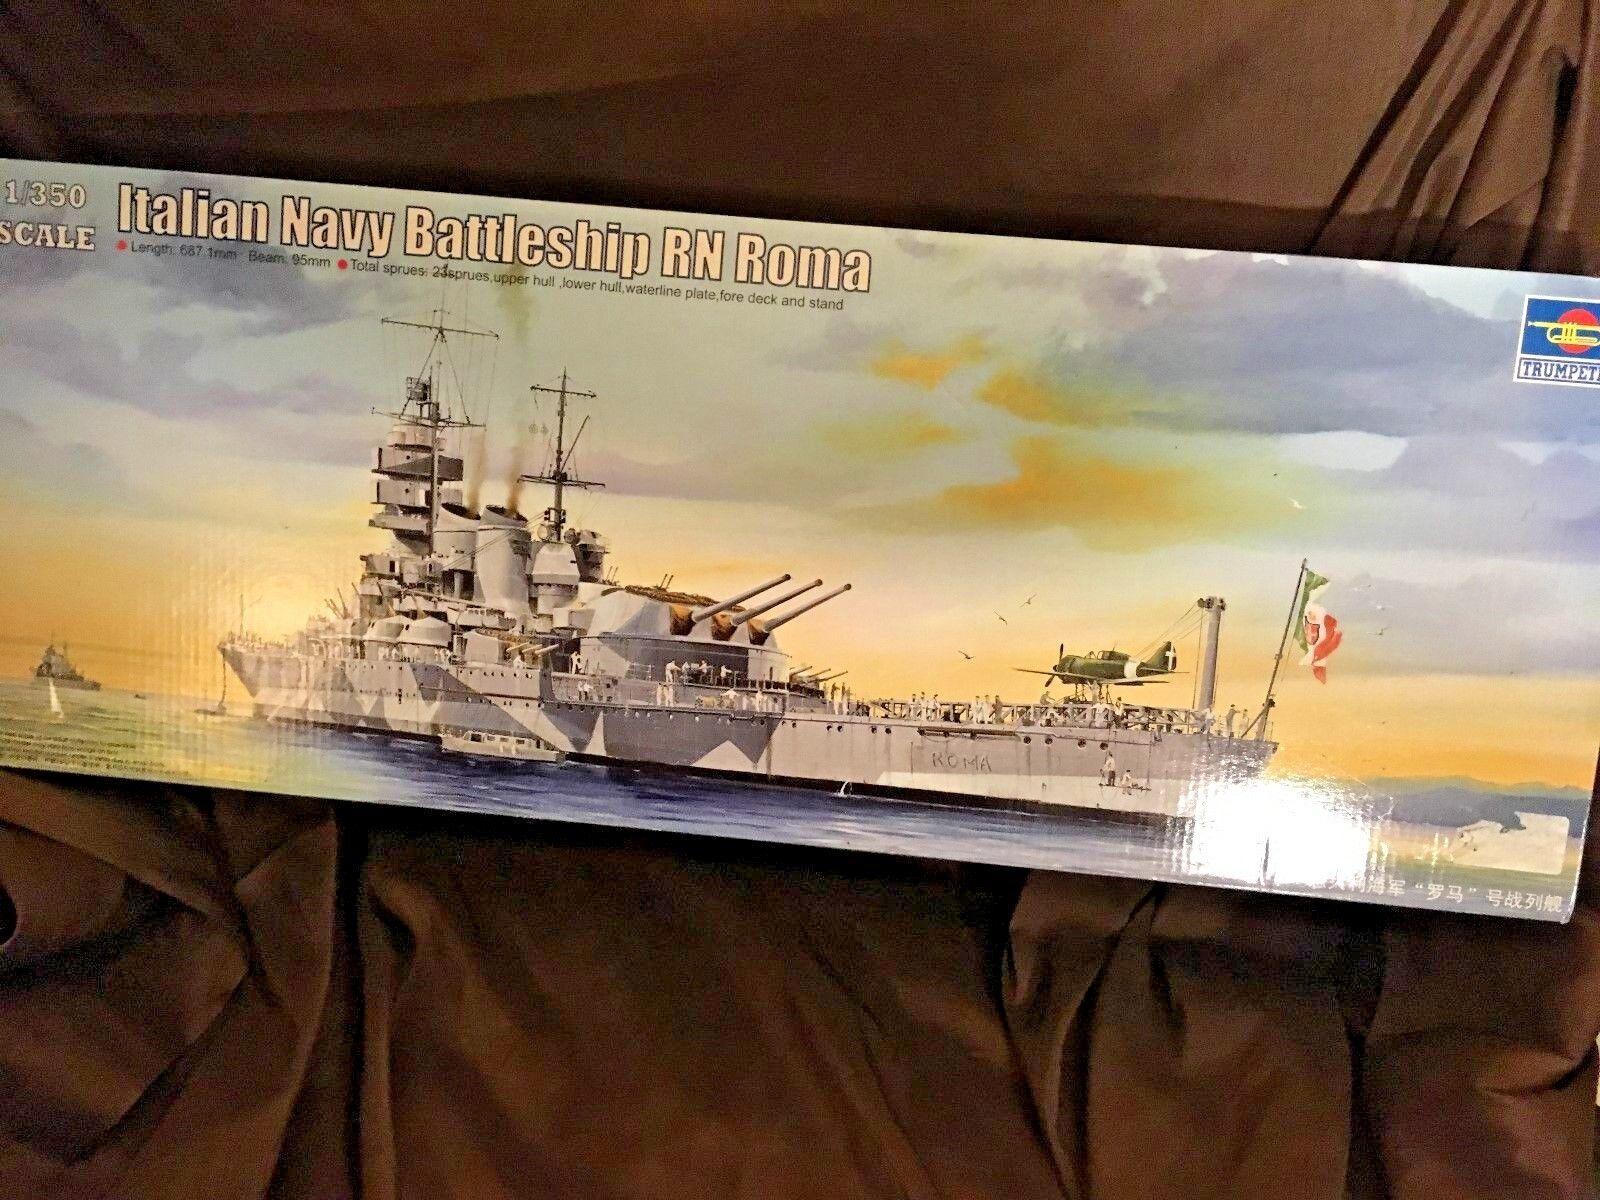 05318 Trumpeter Italian Navy Battleship RN Roma Warship Kit 1 350 Model DIY